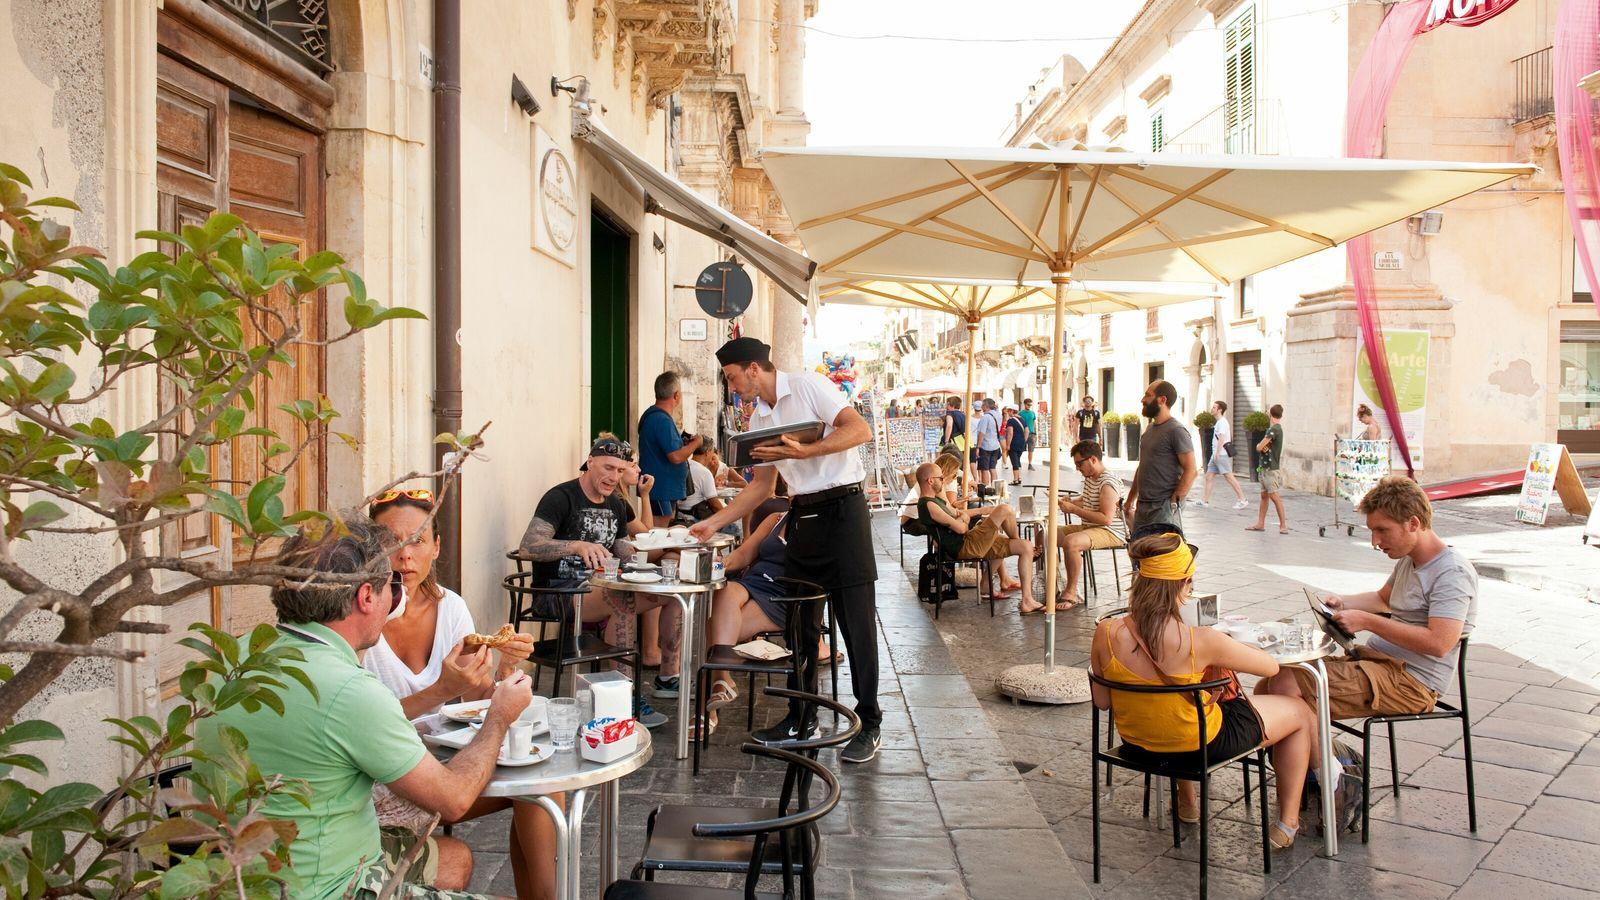 Caffè Sicilia, on Corso Vittorio Emanuele in the town of Noto, Sicily, is a hallowed spot ...